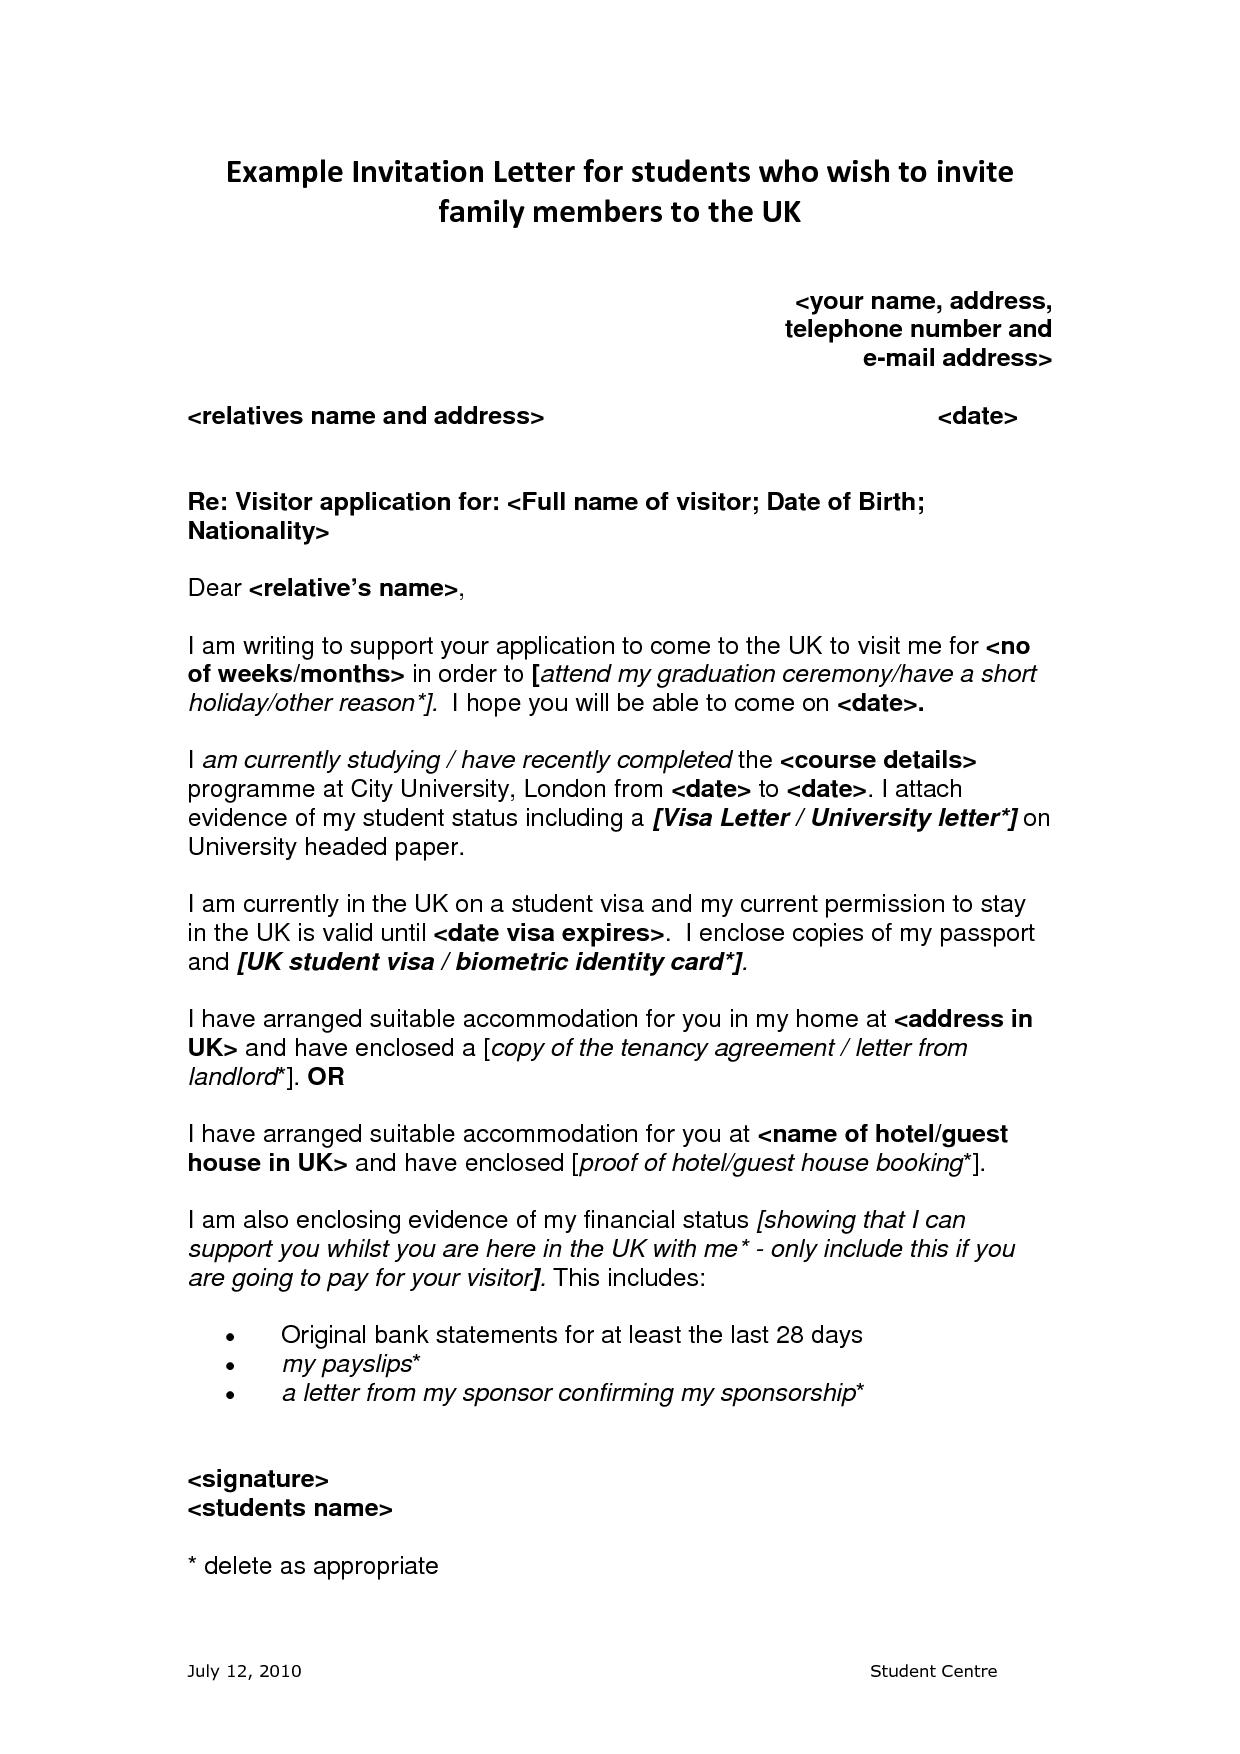 Example Of Invitation Letter For Business Visa Trumark